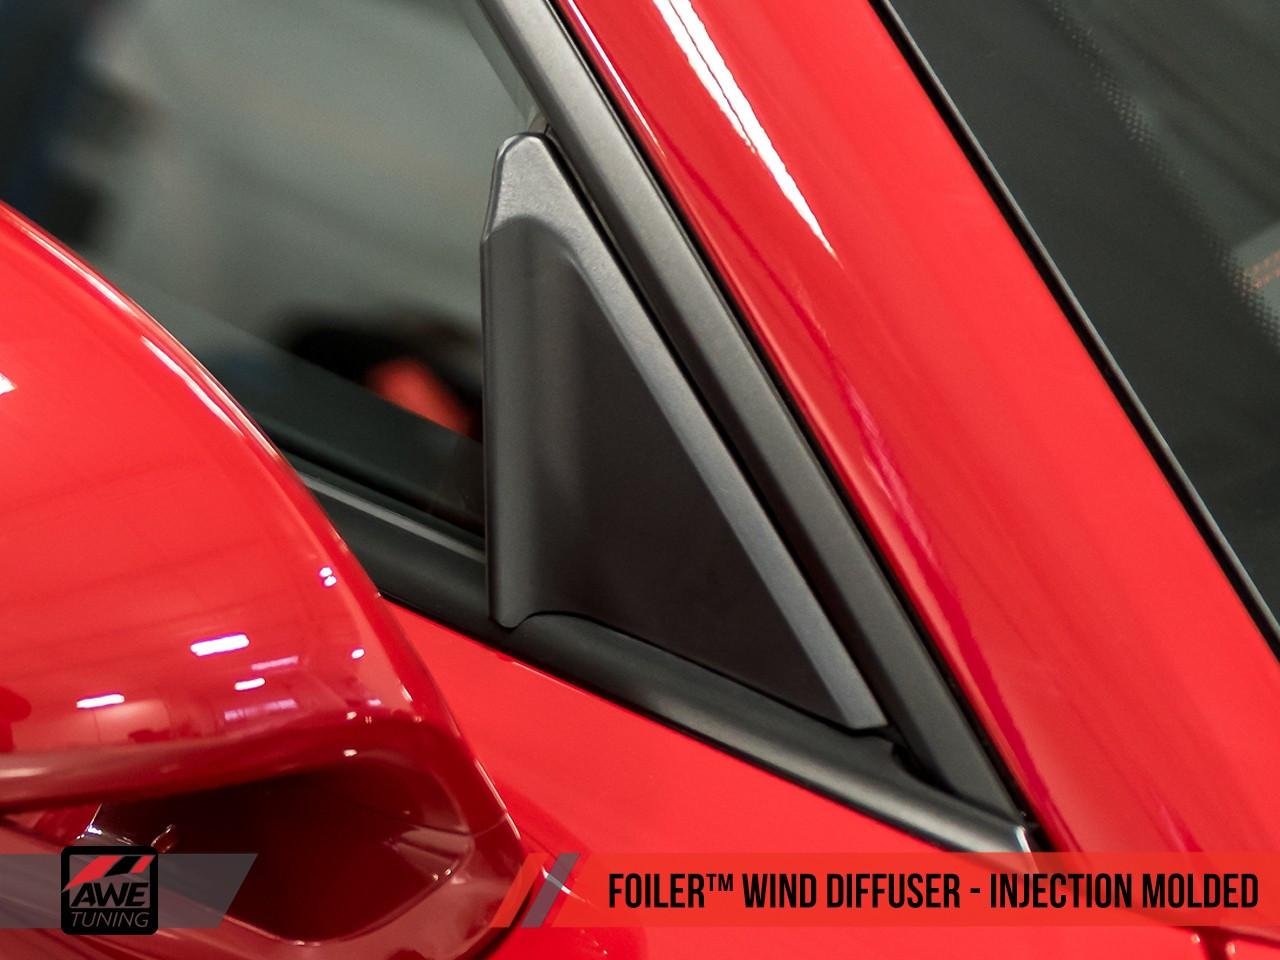 AWE Tuning - Foiler Wind Diffuser - 911 991